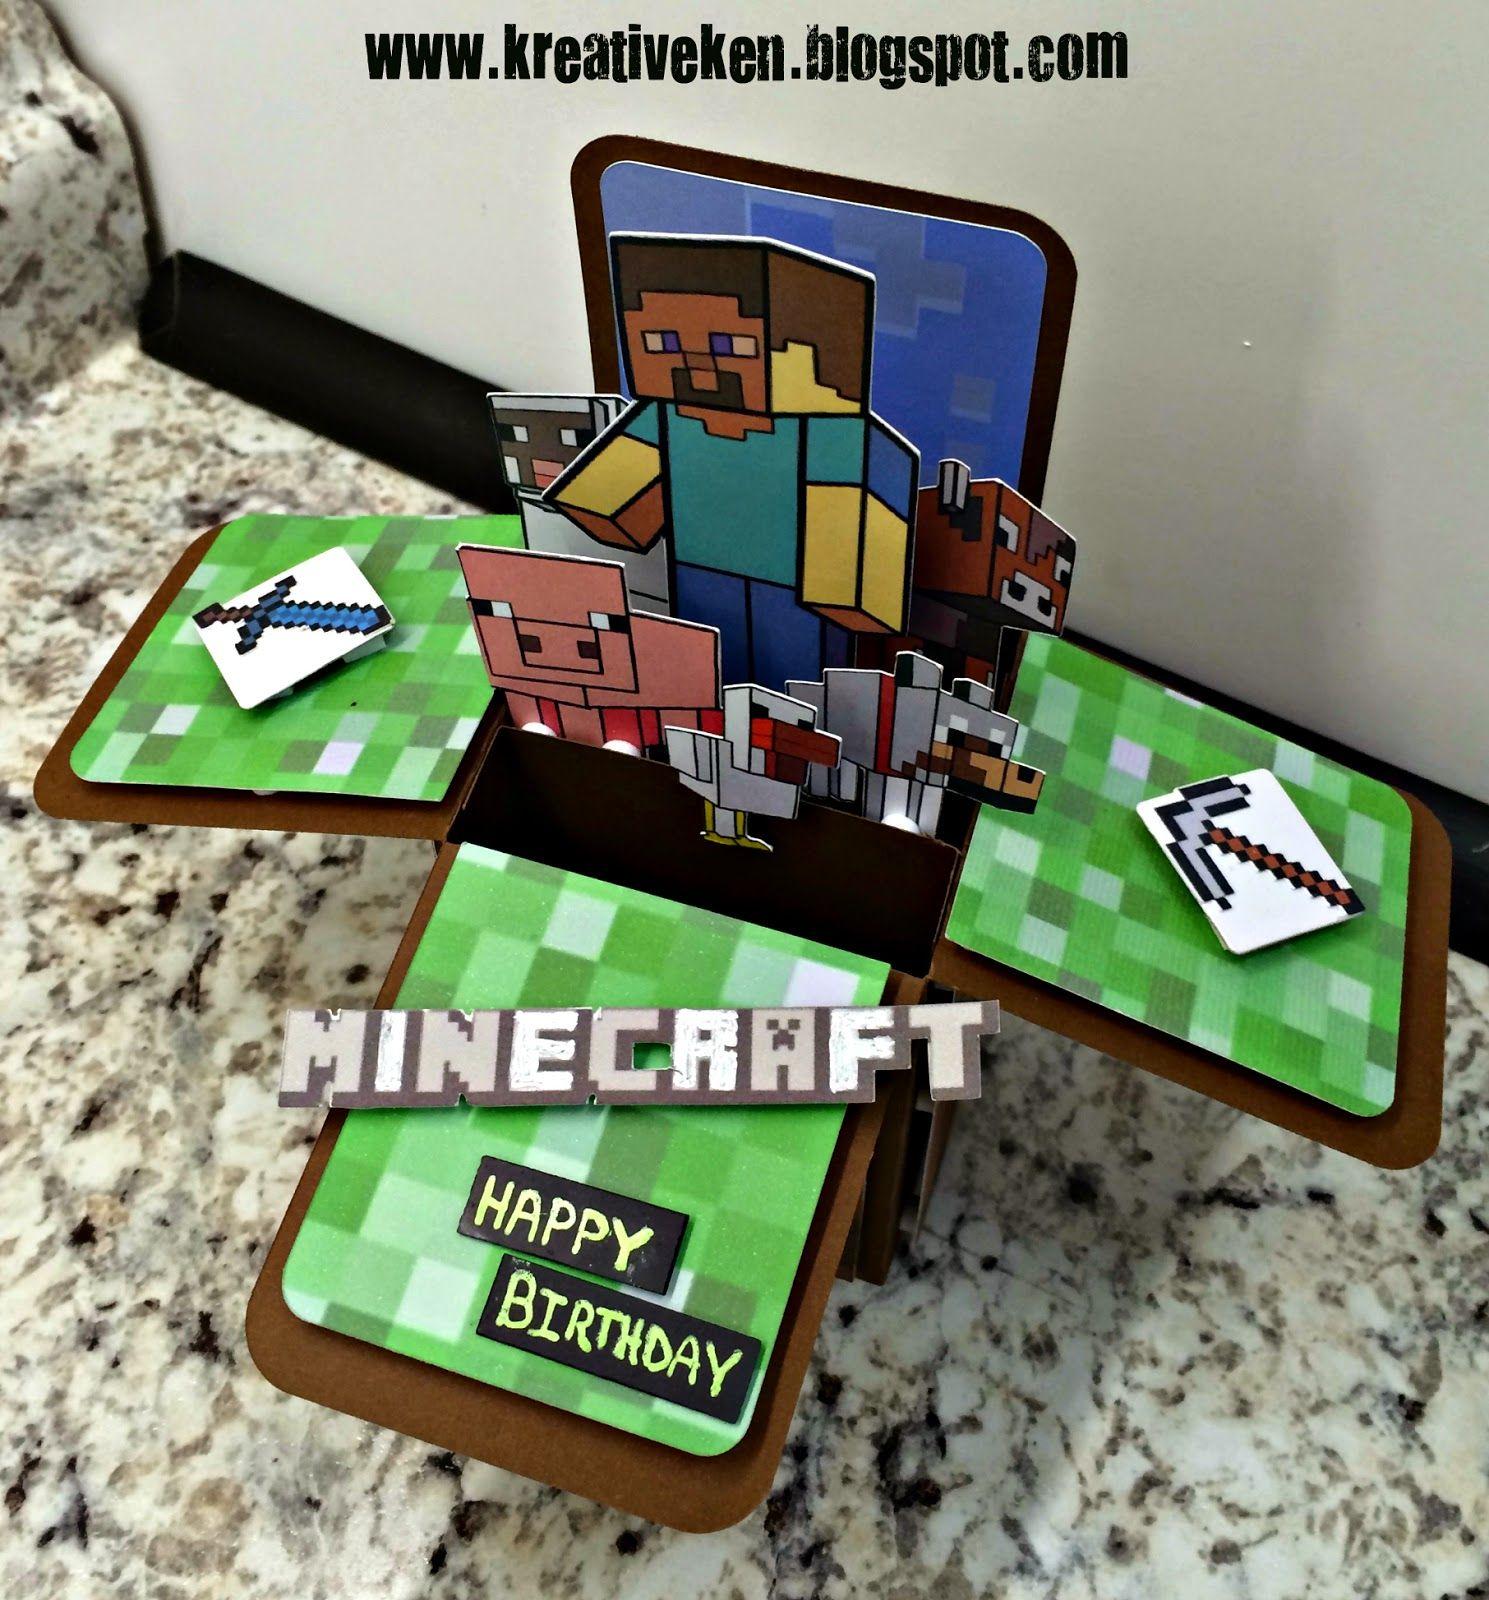 MINECRAFT BIRTHDAY CARD Minecraft birthday card